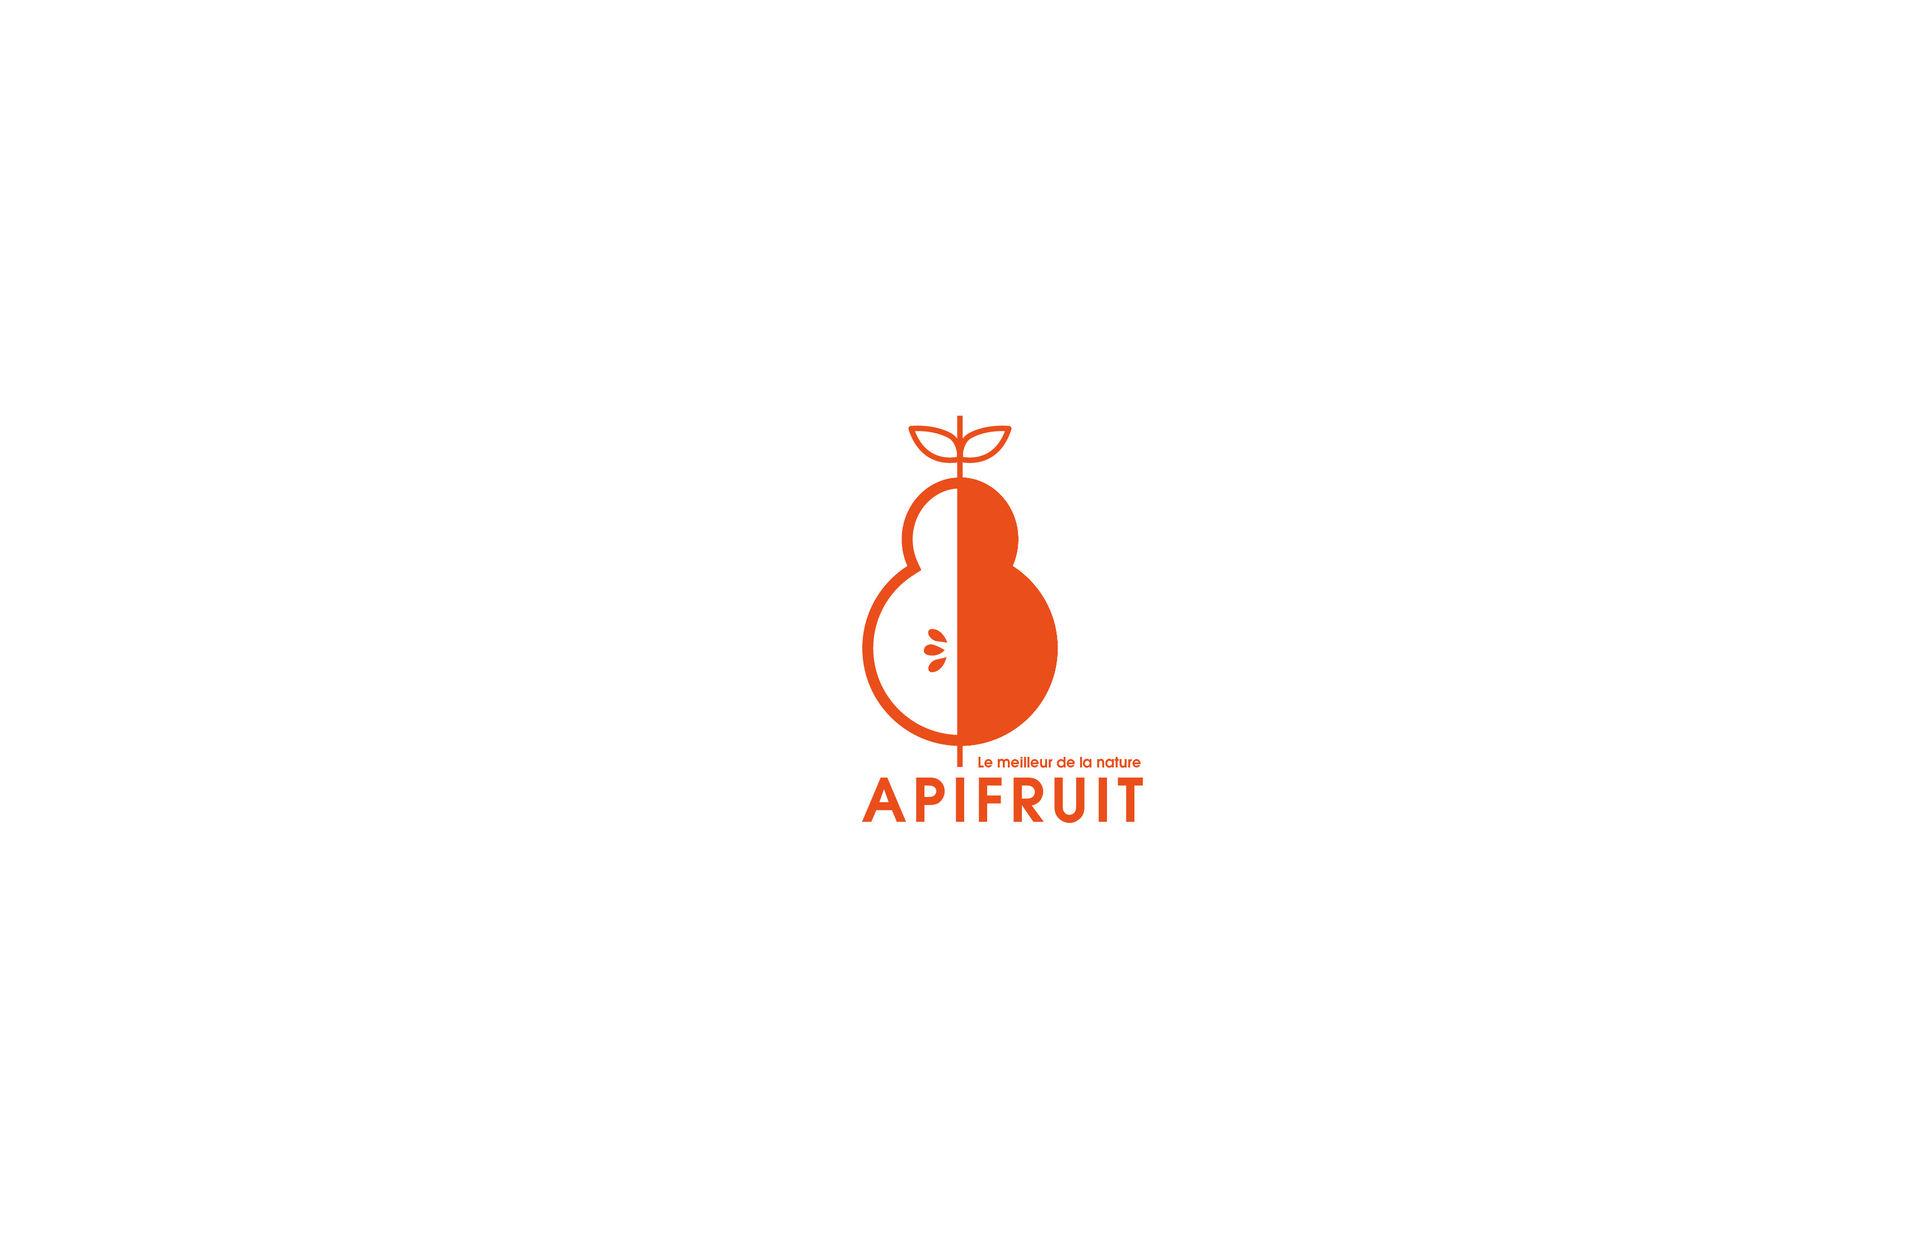 Projets site Appifruit Logo 1.jpg